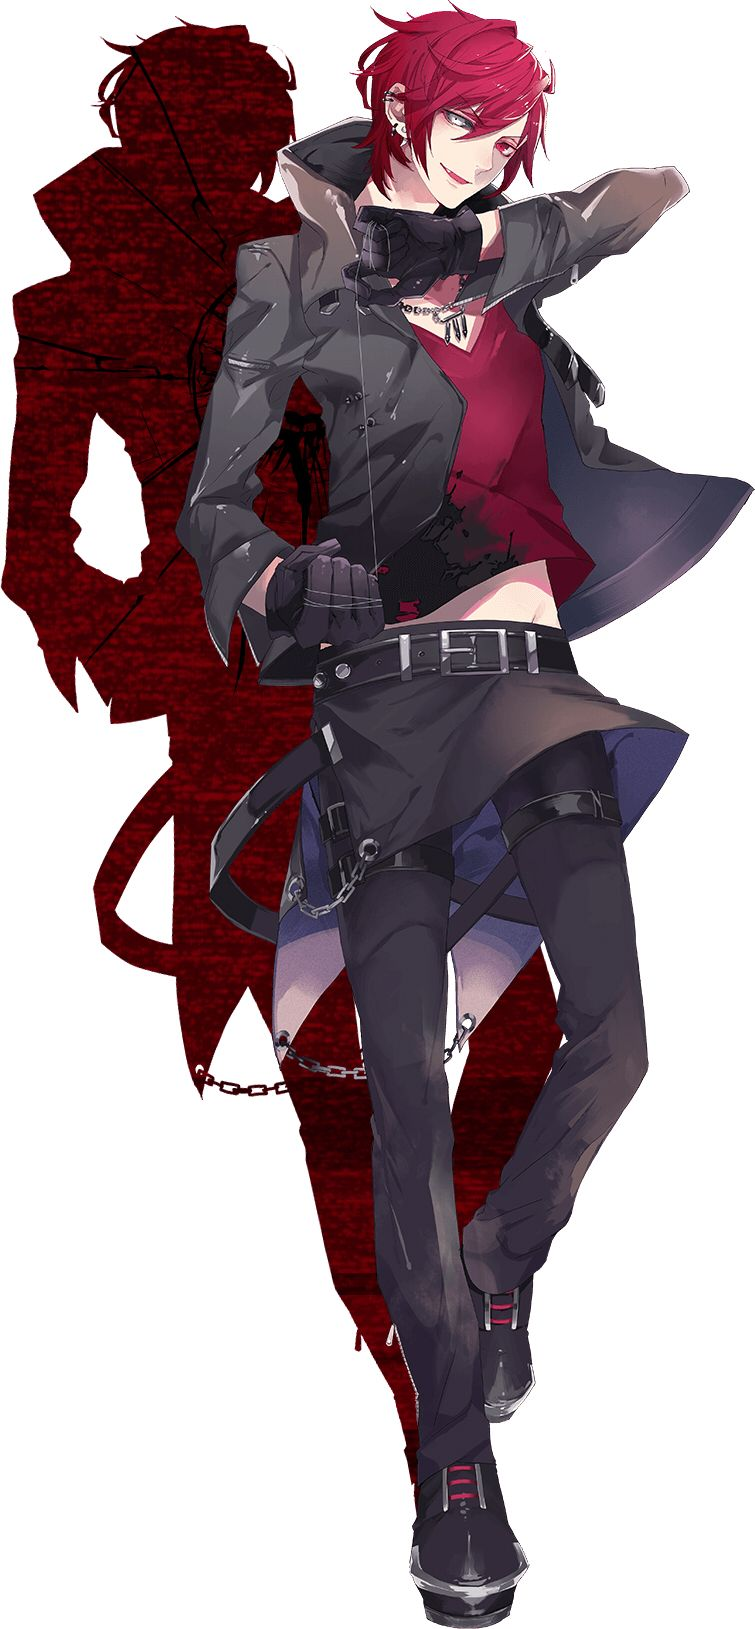 Badass Anime Character Design : Chara criminale cute boy pinterest taps much